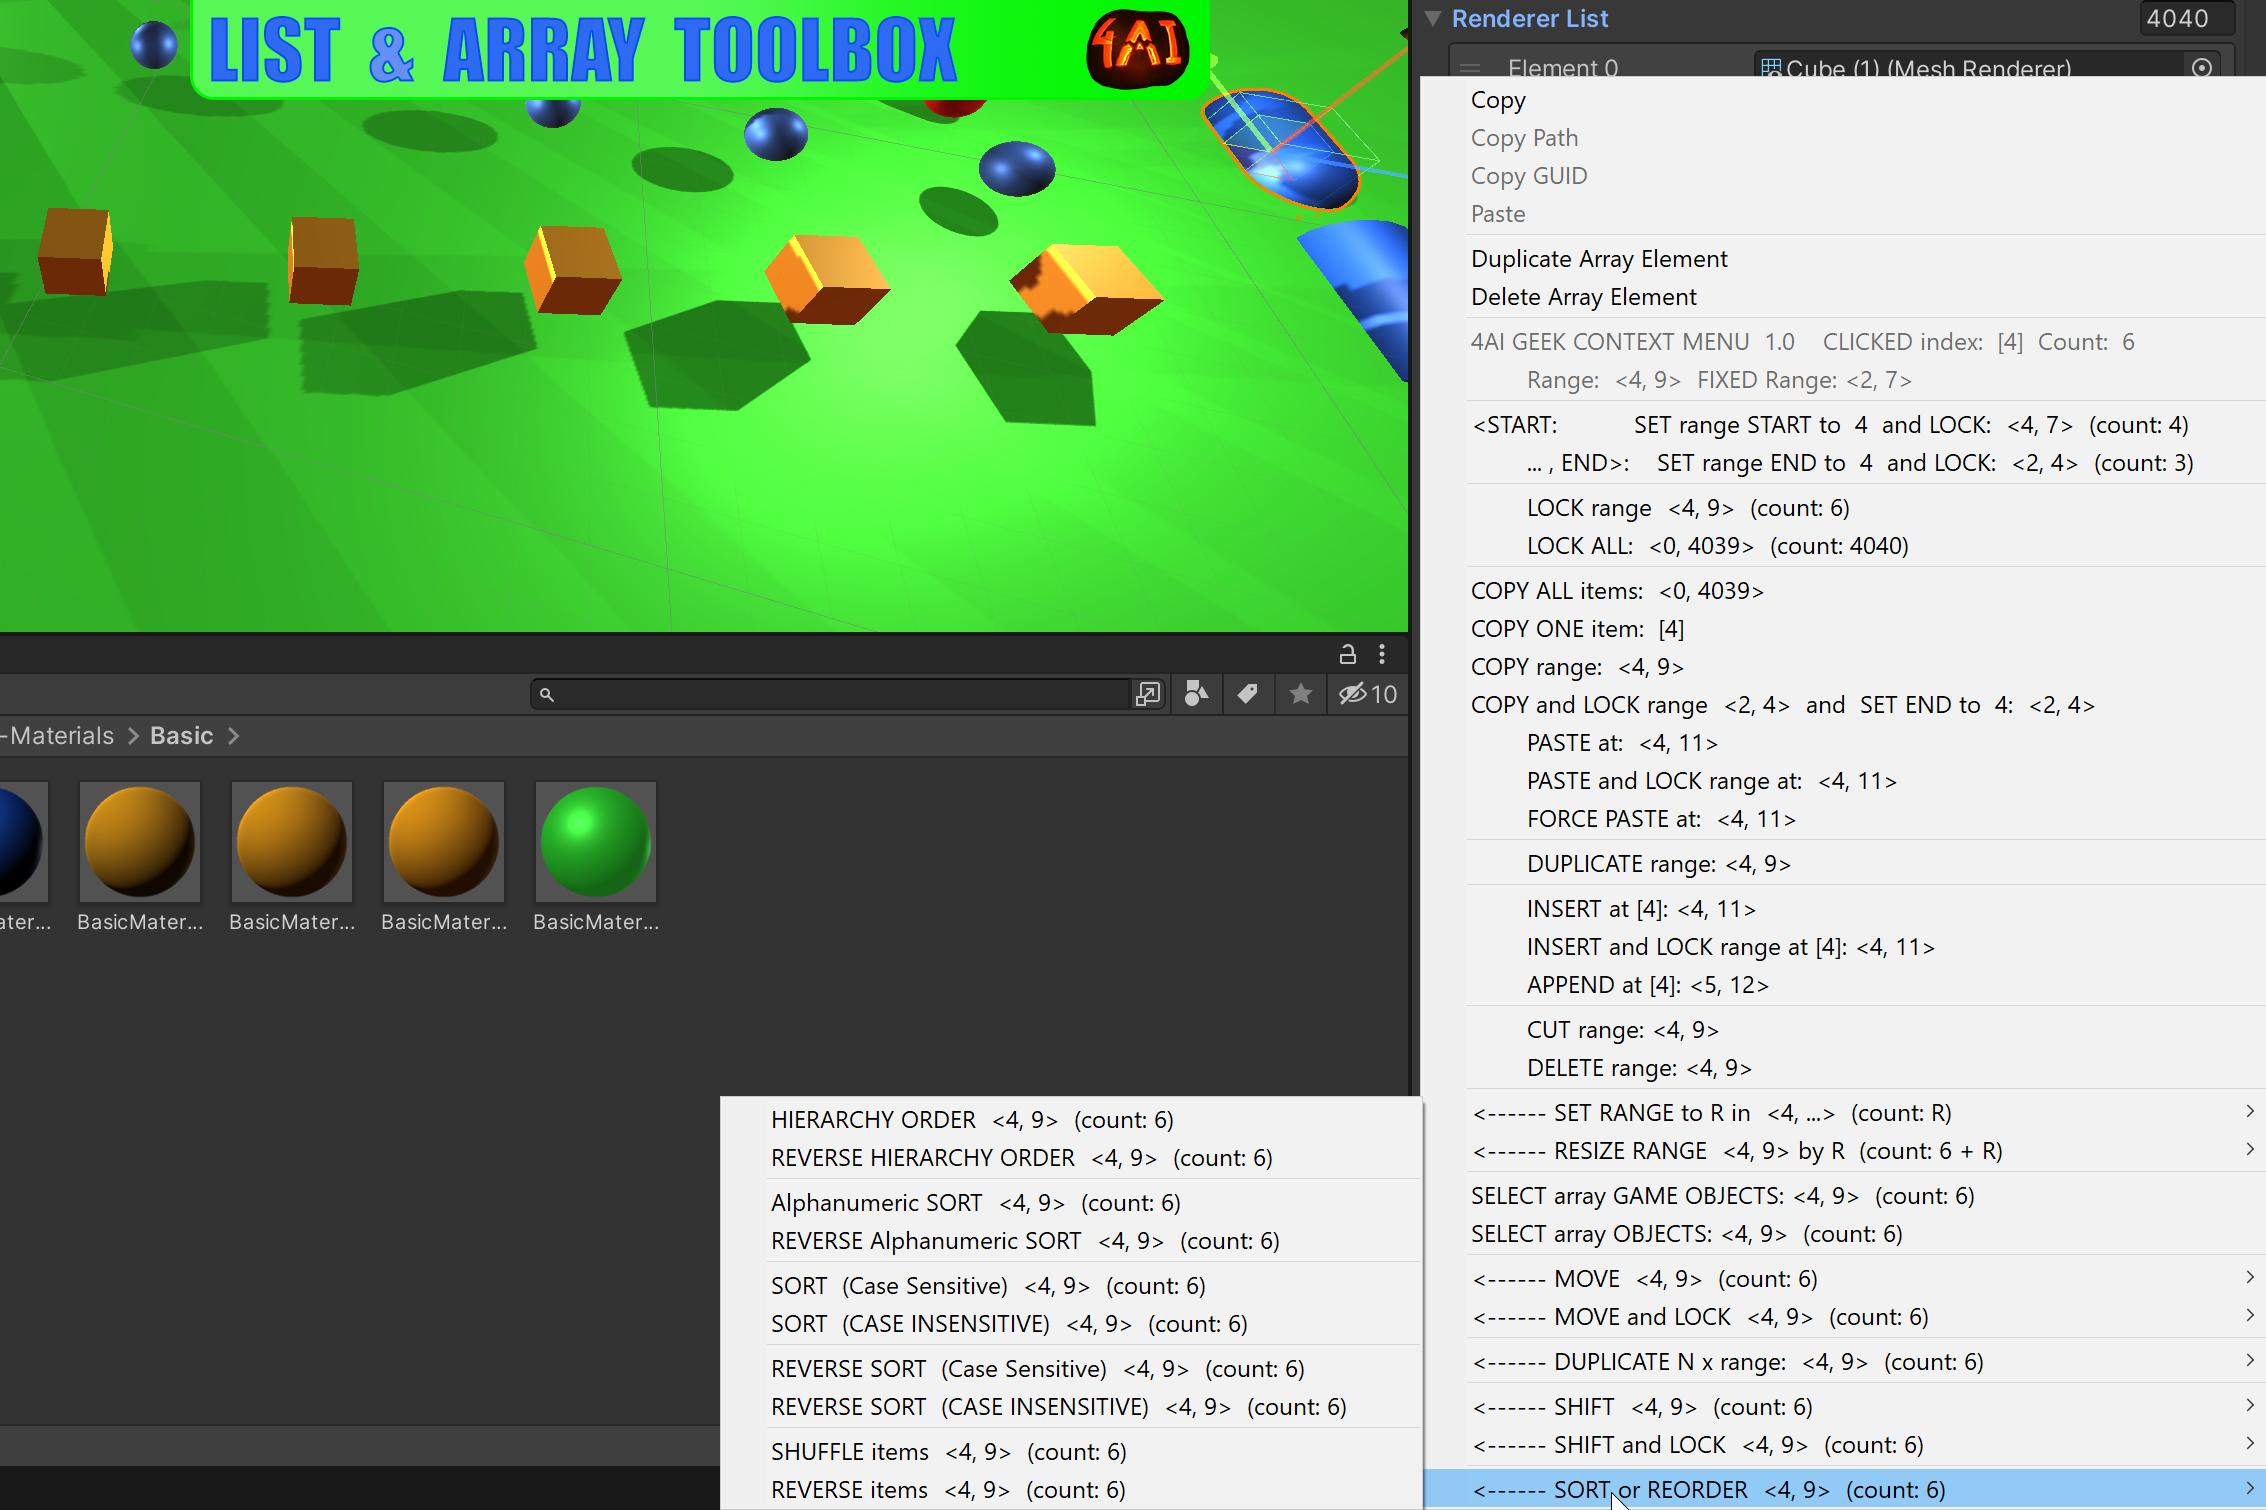 list-array-toolbox-107.png